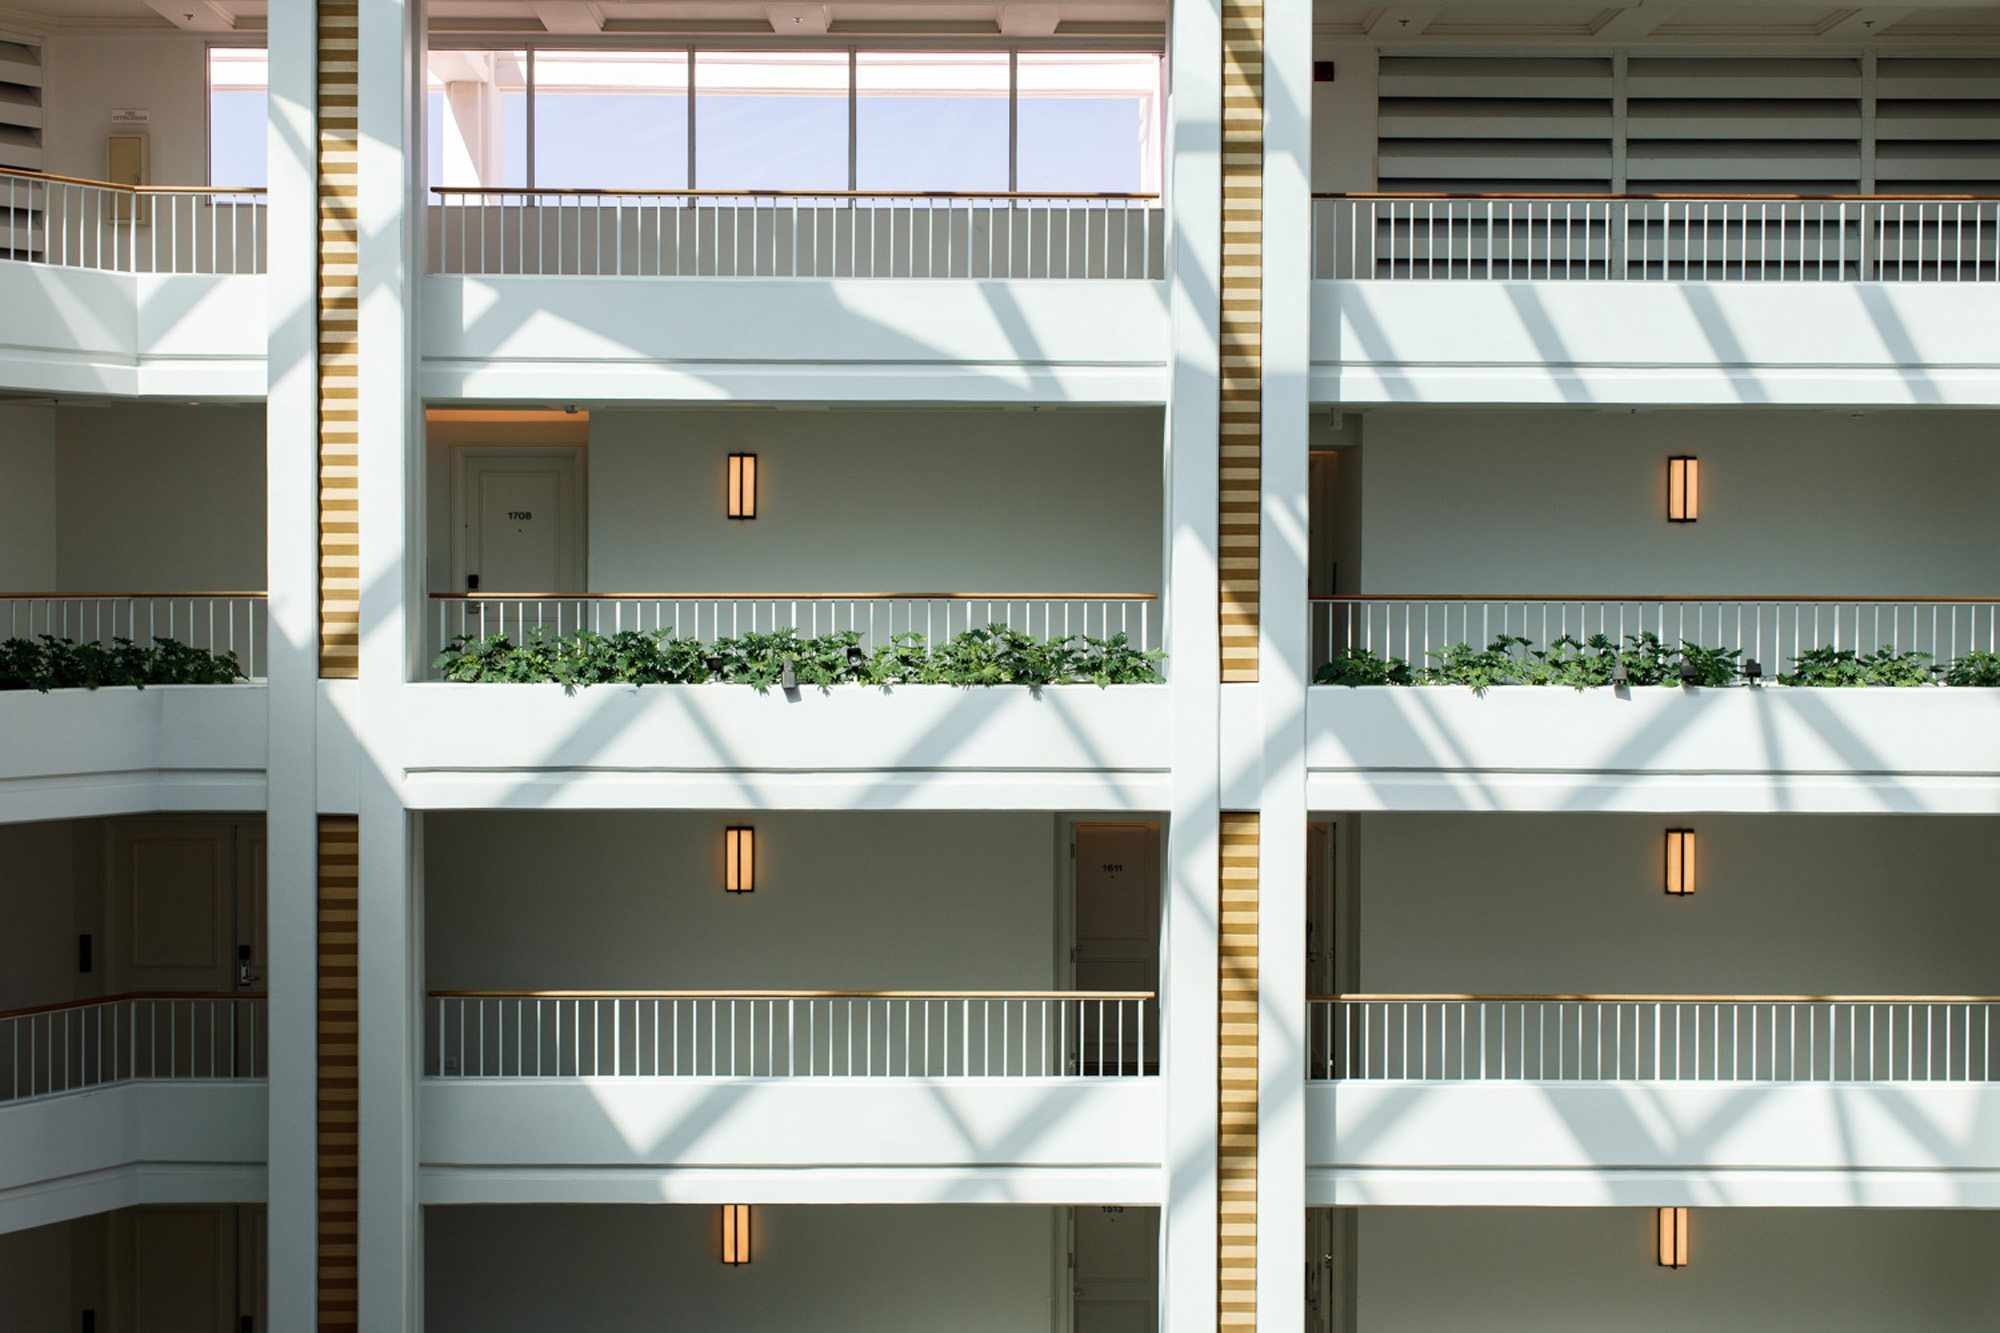 Oahu hotel balconies